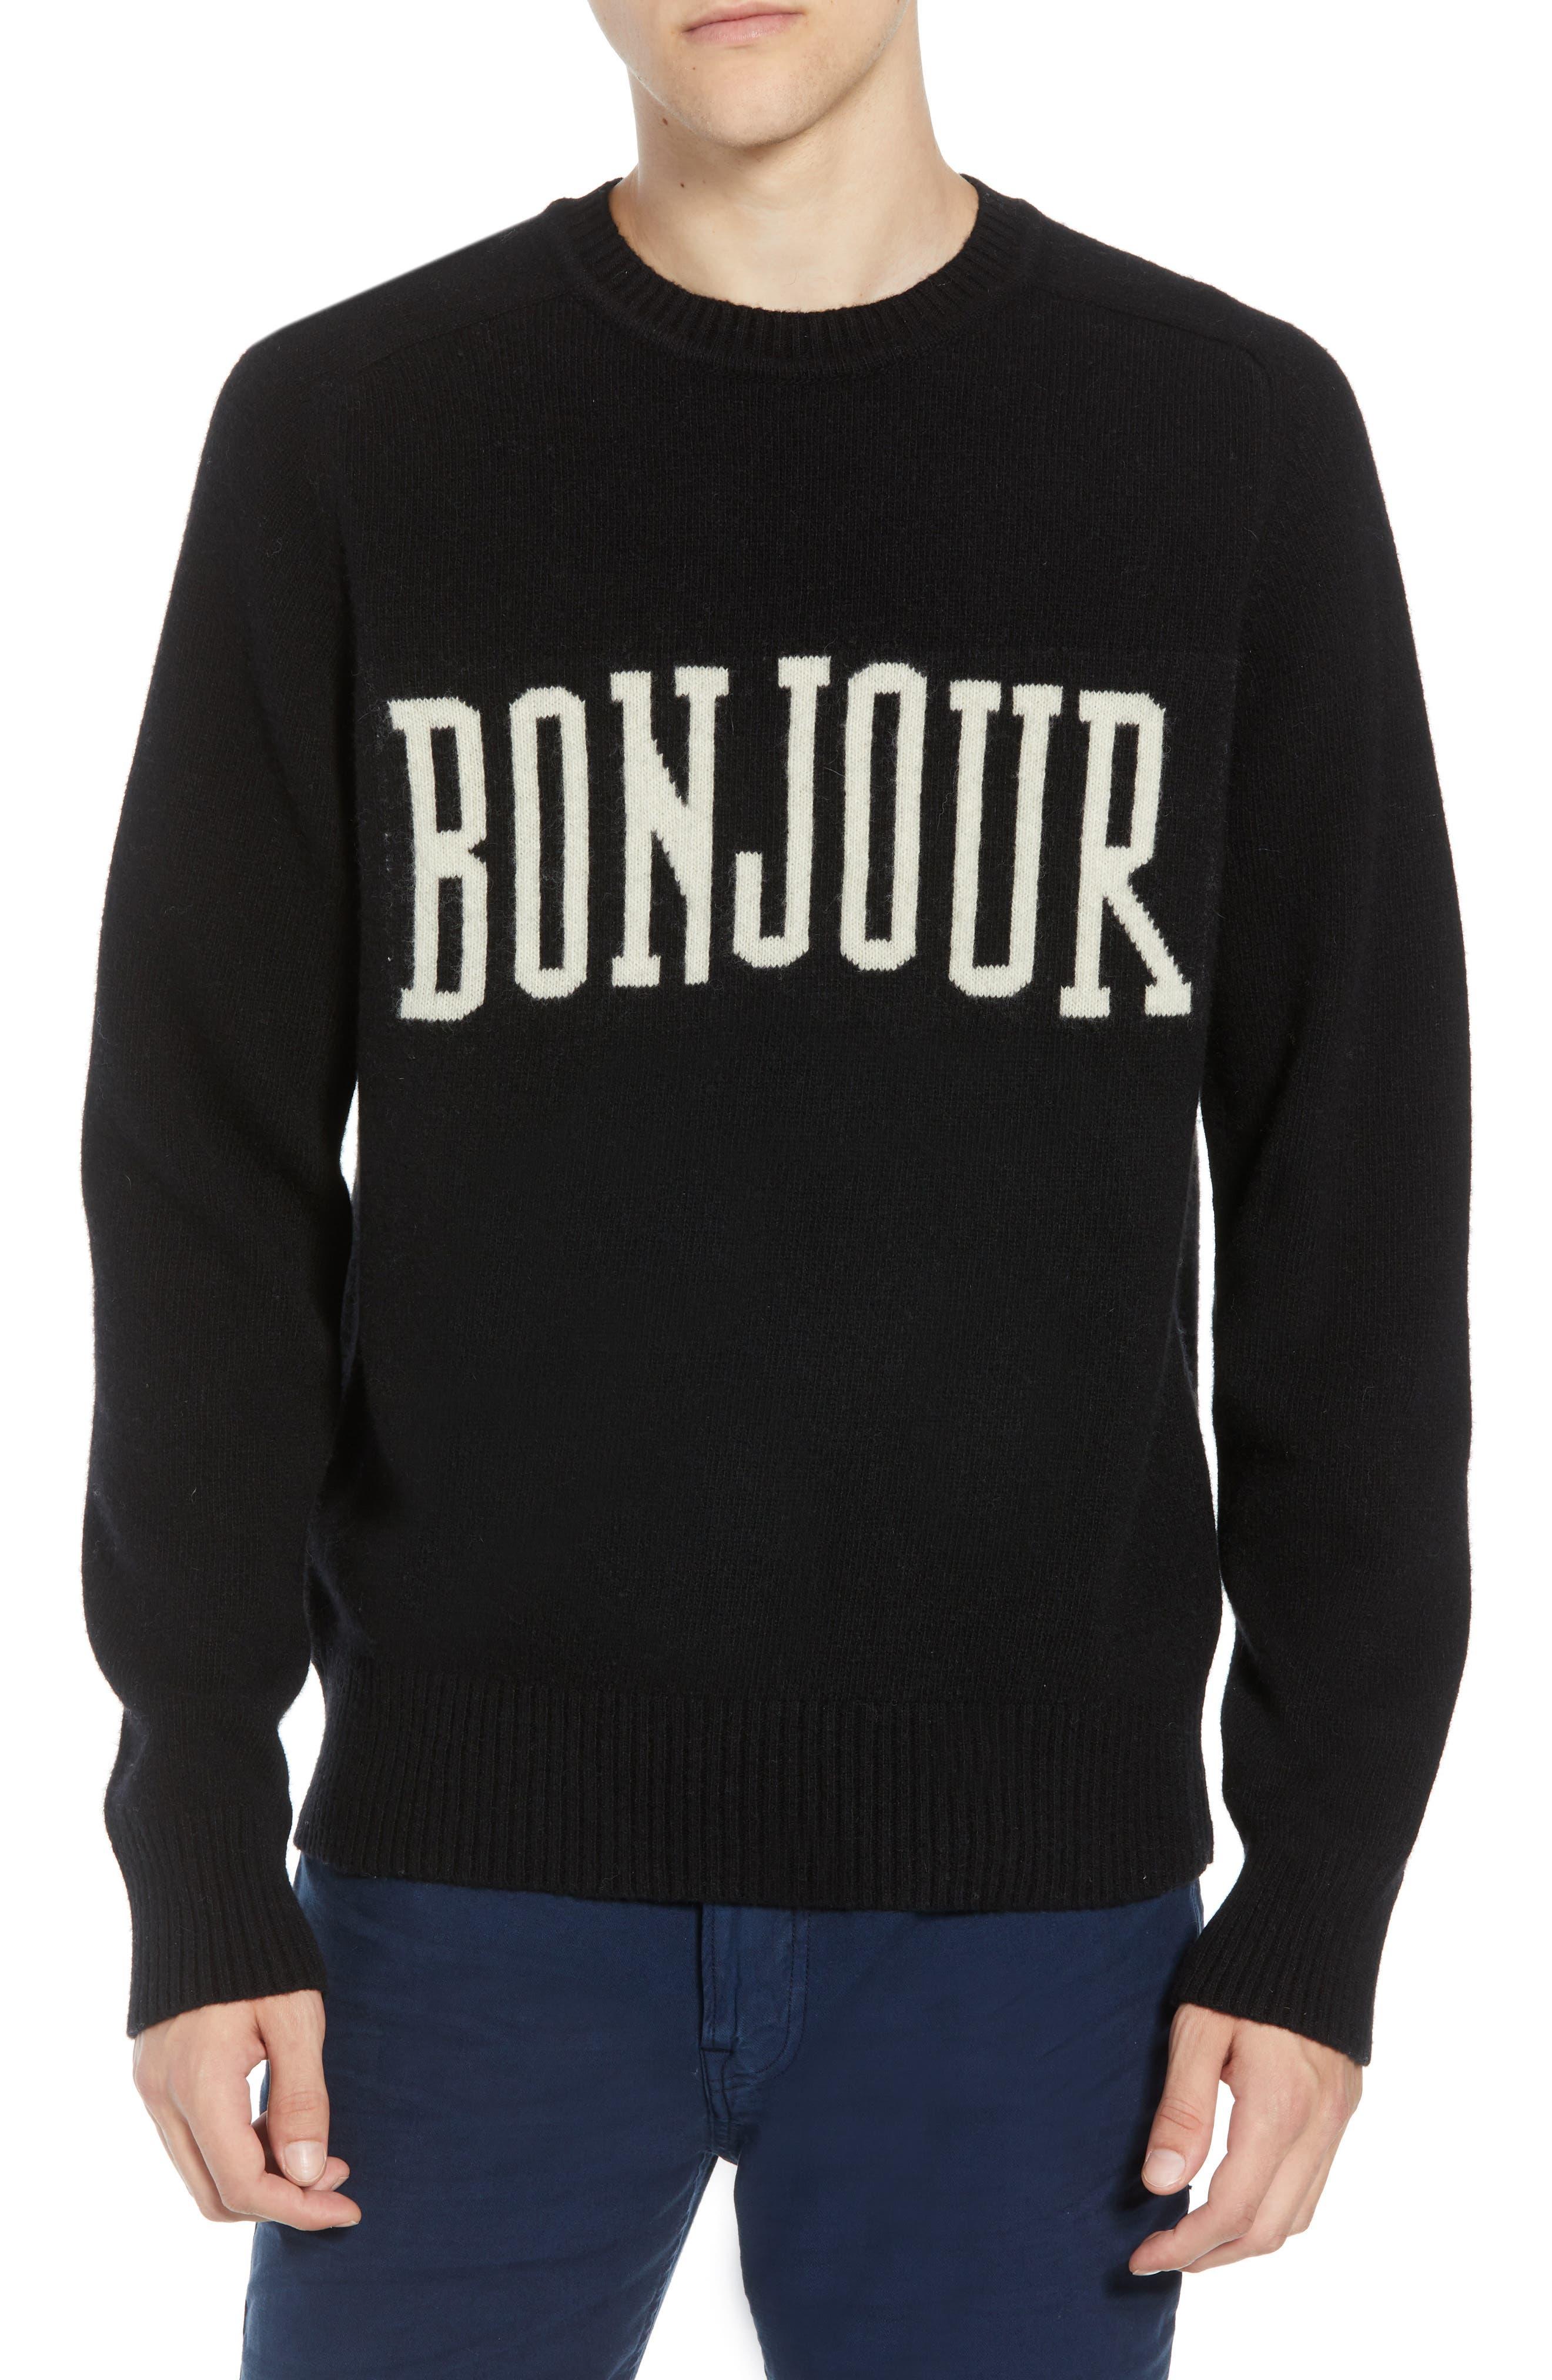 Bonjour Wool Blend Sweater,                             Main thumbnail 1, color,                             BLACK WHITECAP GREY